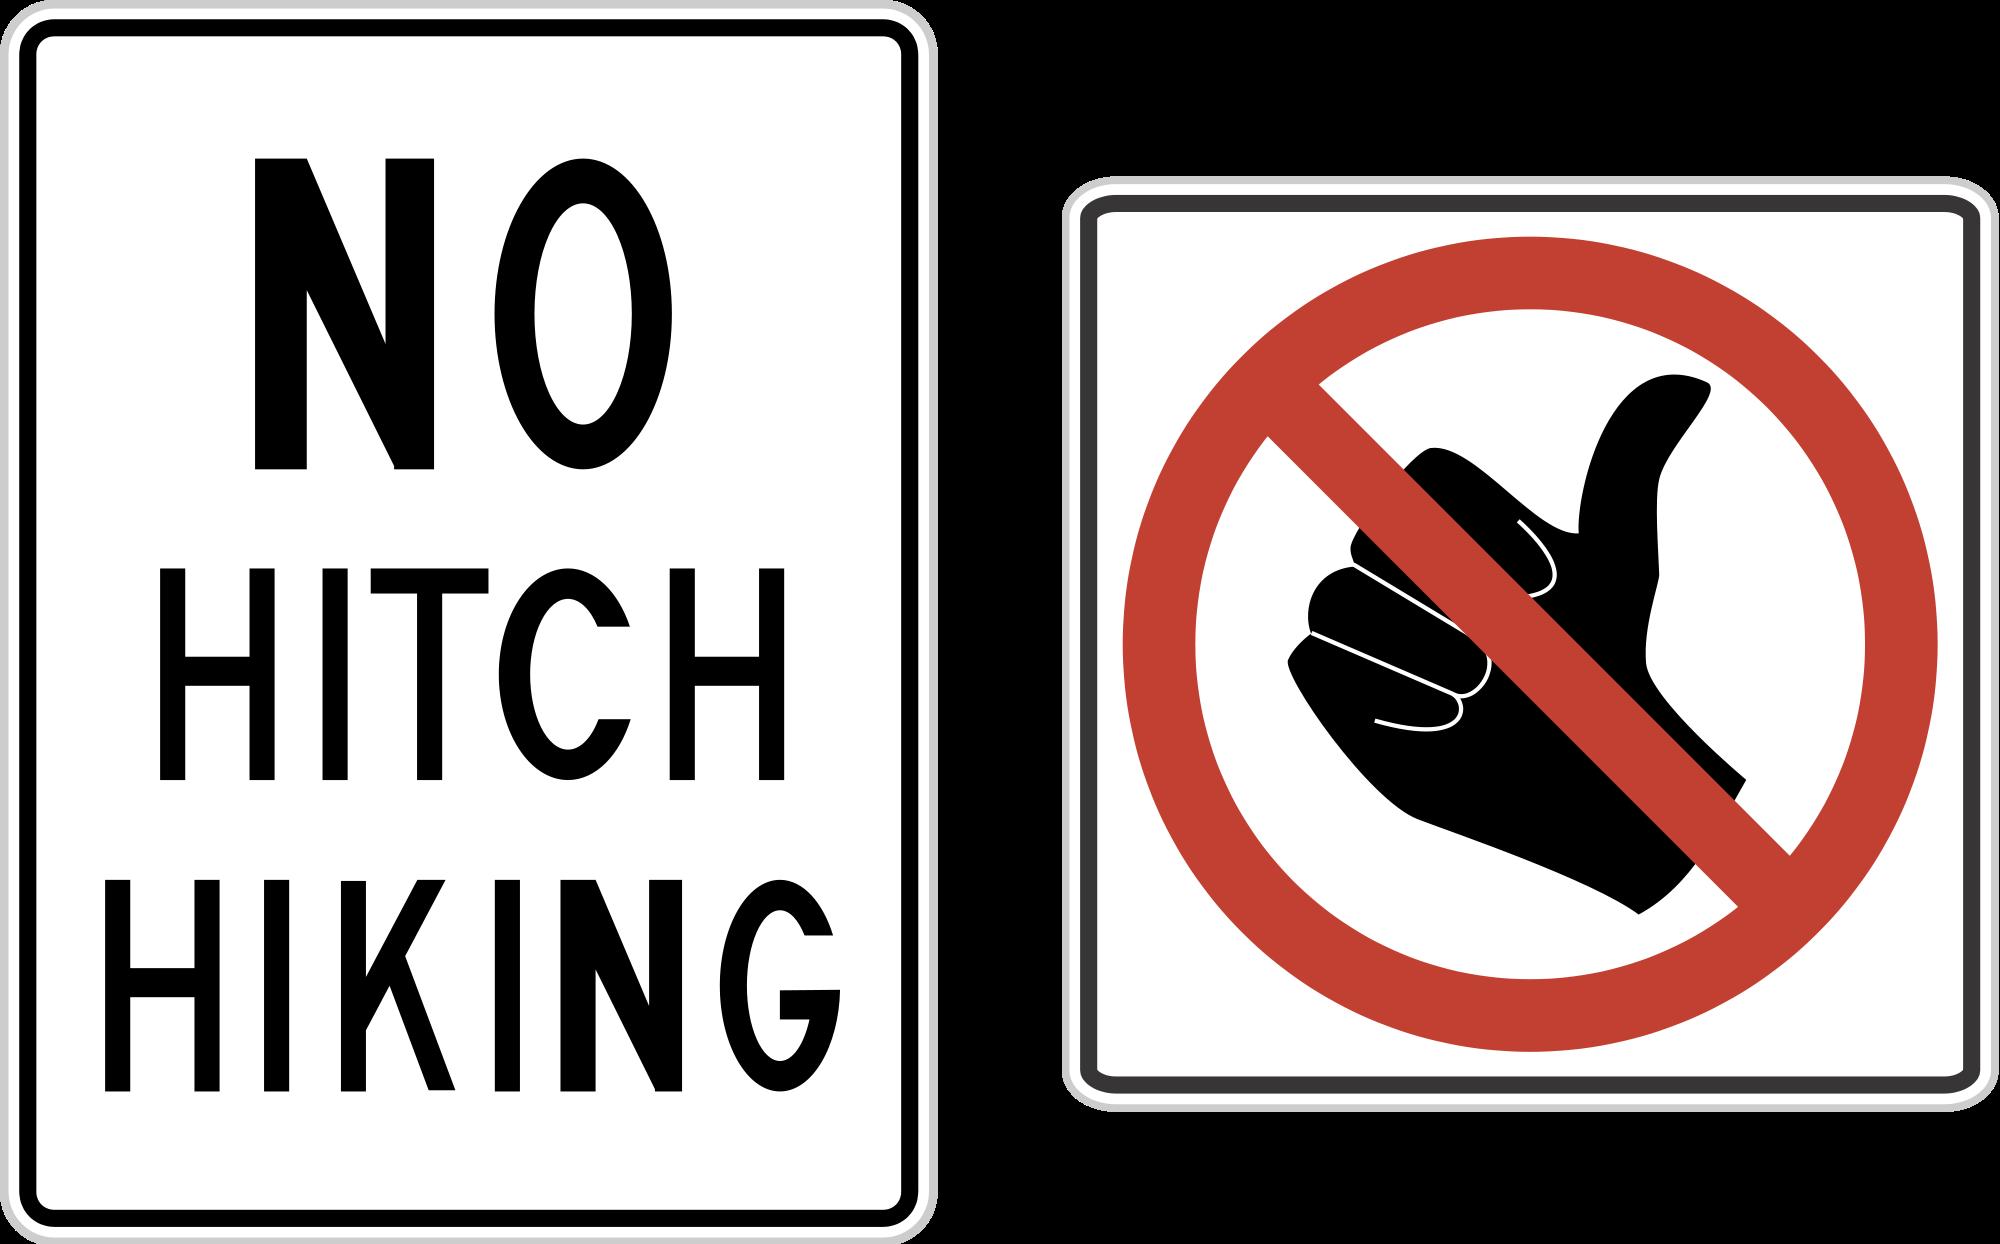 File us no hitchhiking. Thumb clipart hitchhiker's thumb